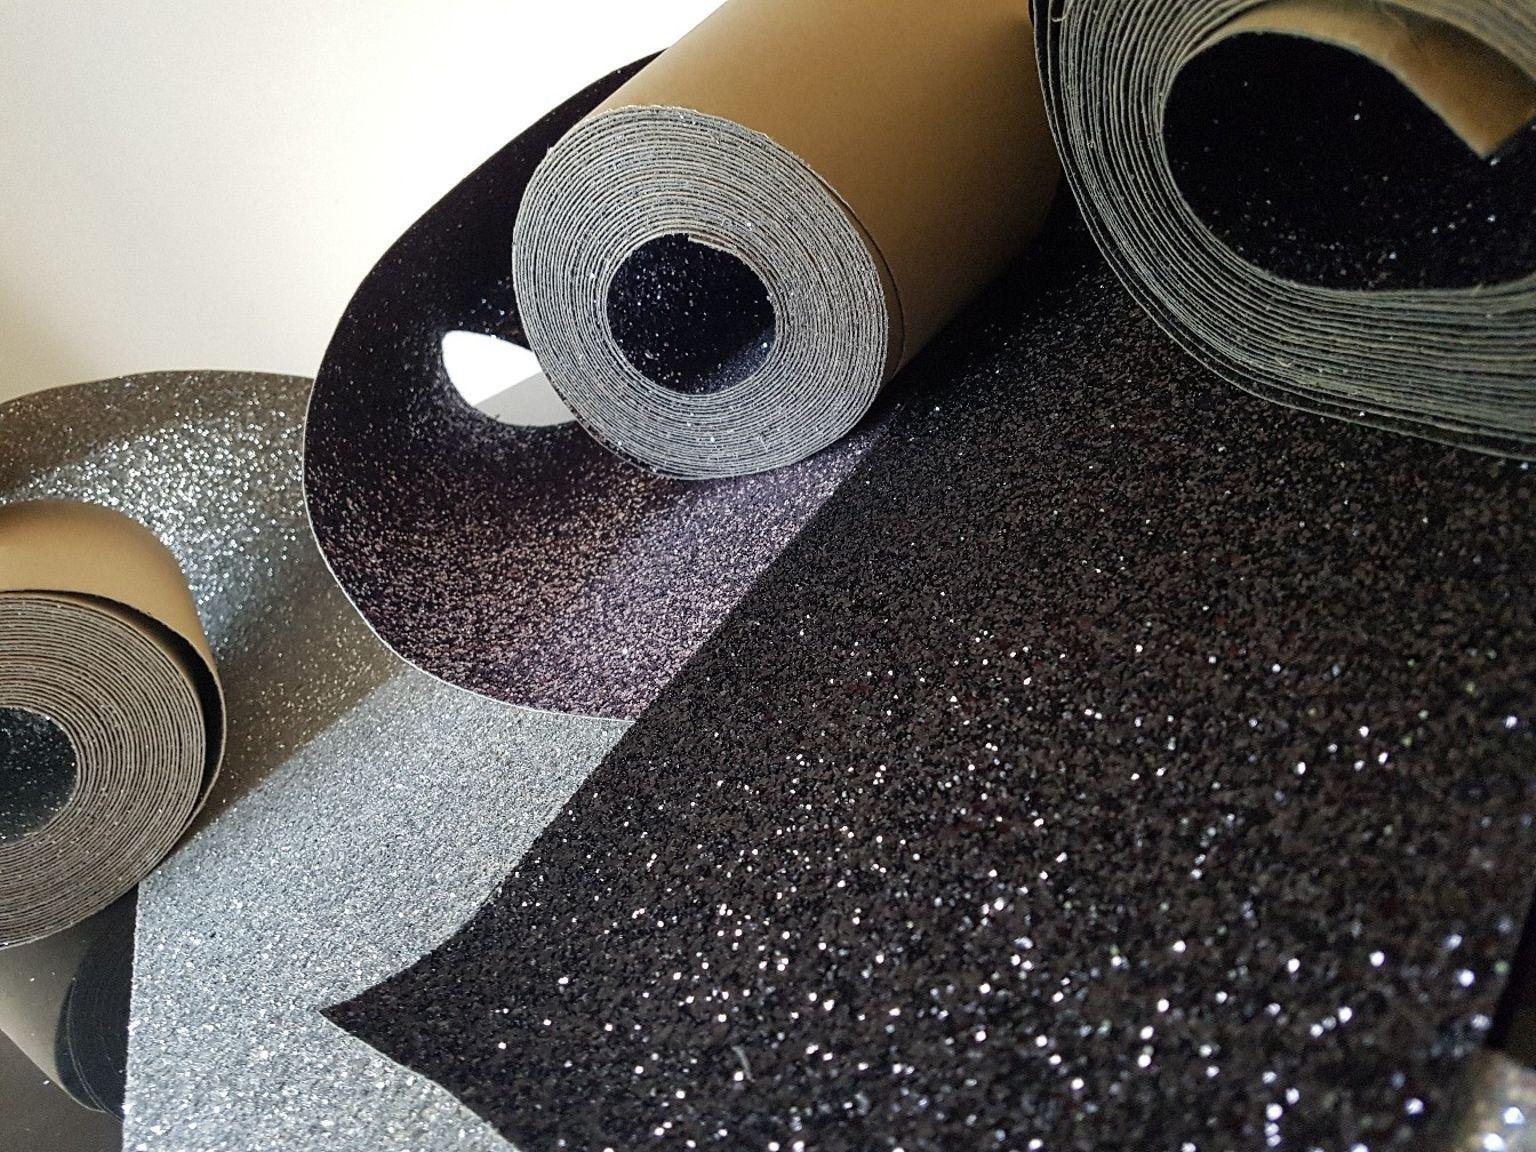 CLEARANCE SALE Glitter Wallpaper Border Self Adhesive 10m x 23cm